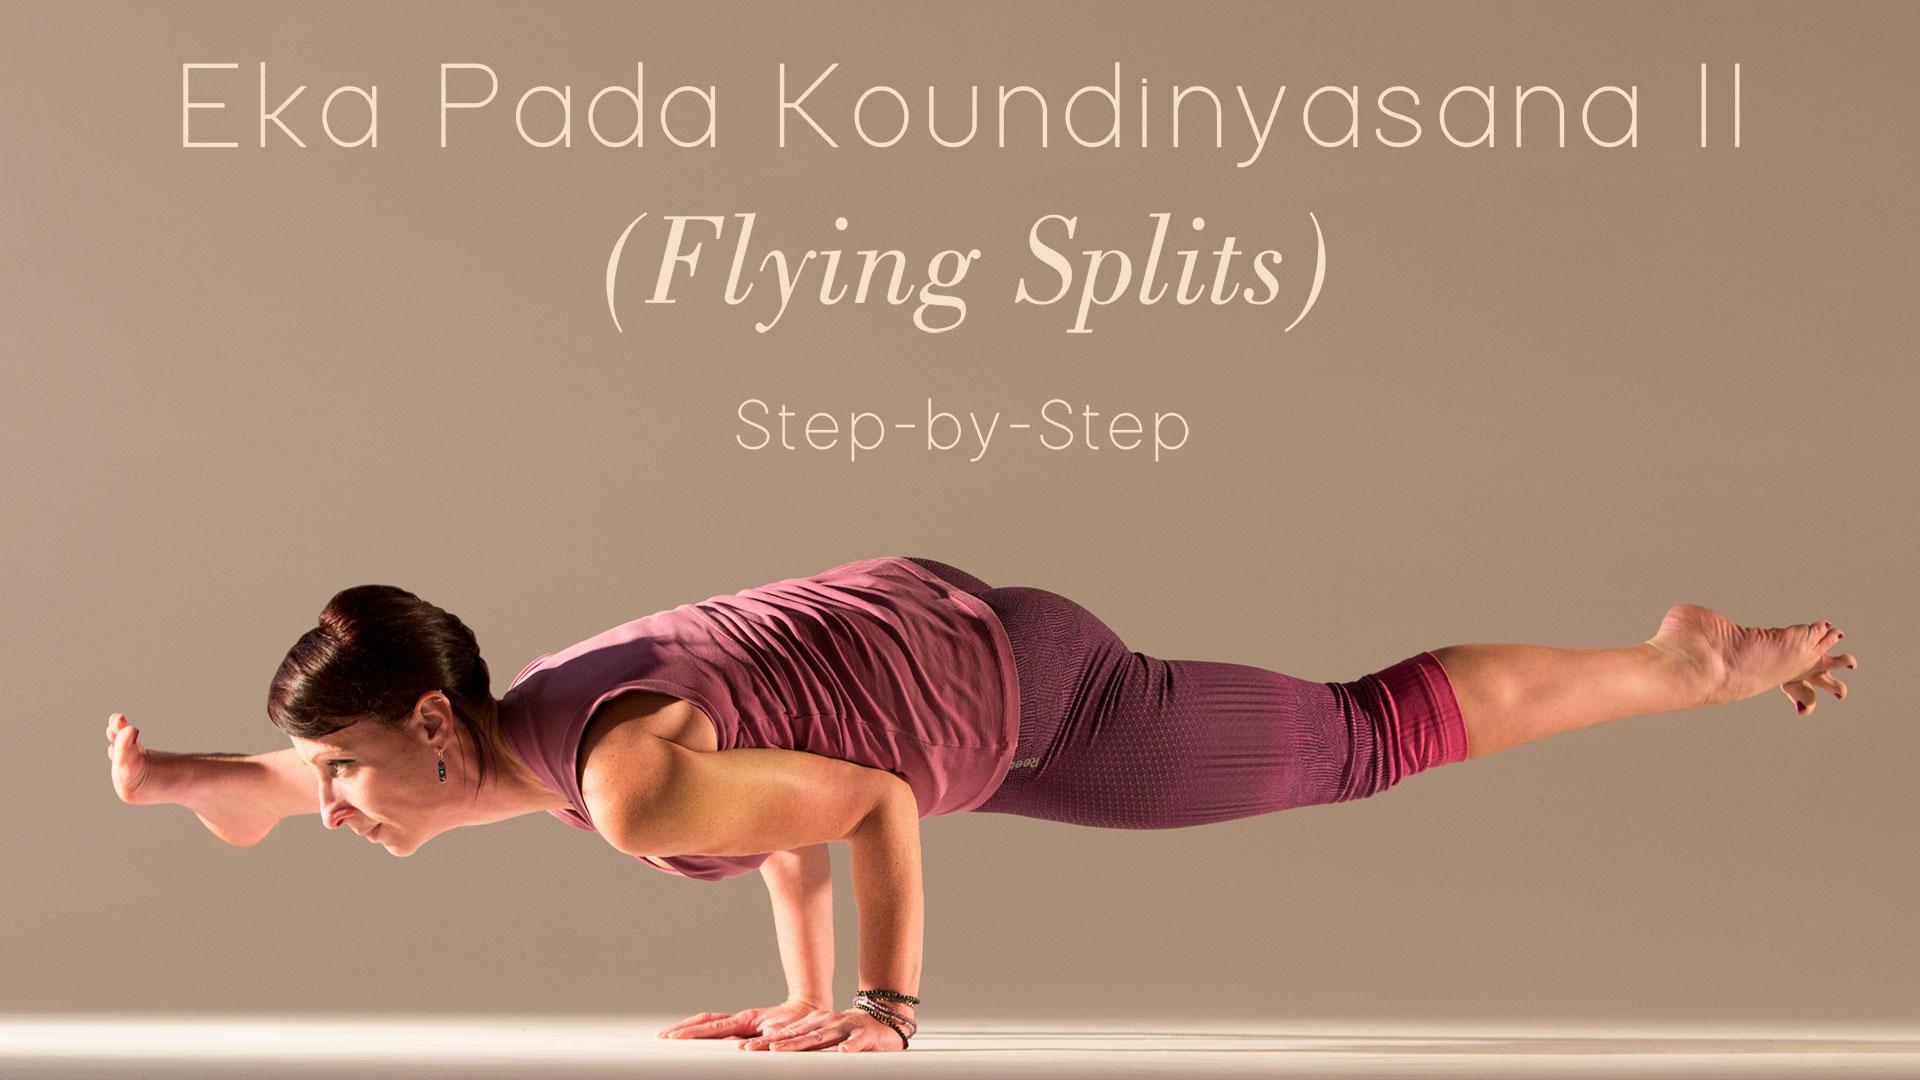 Eka Pada Koundinyasana II Flying Splits Step By